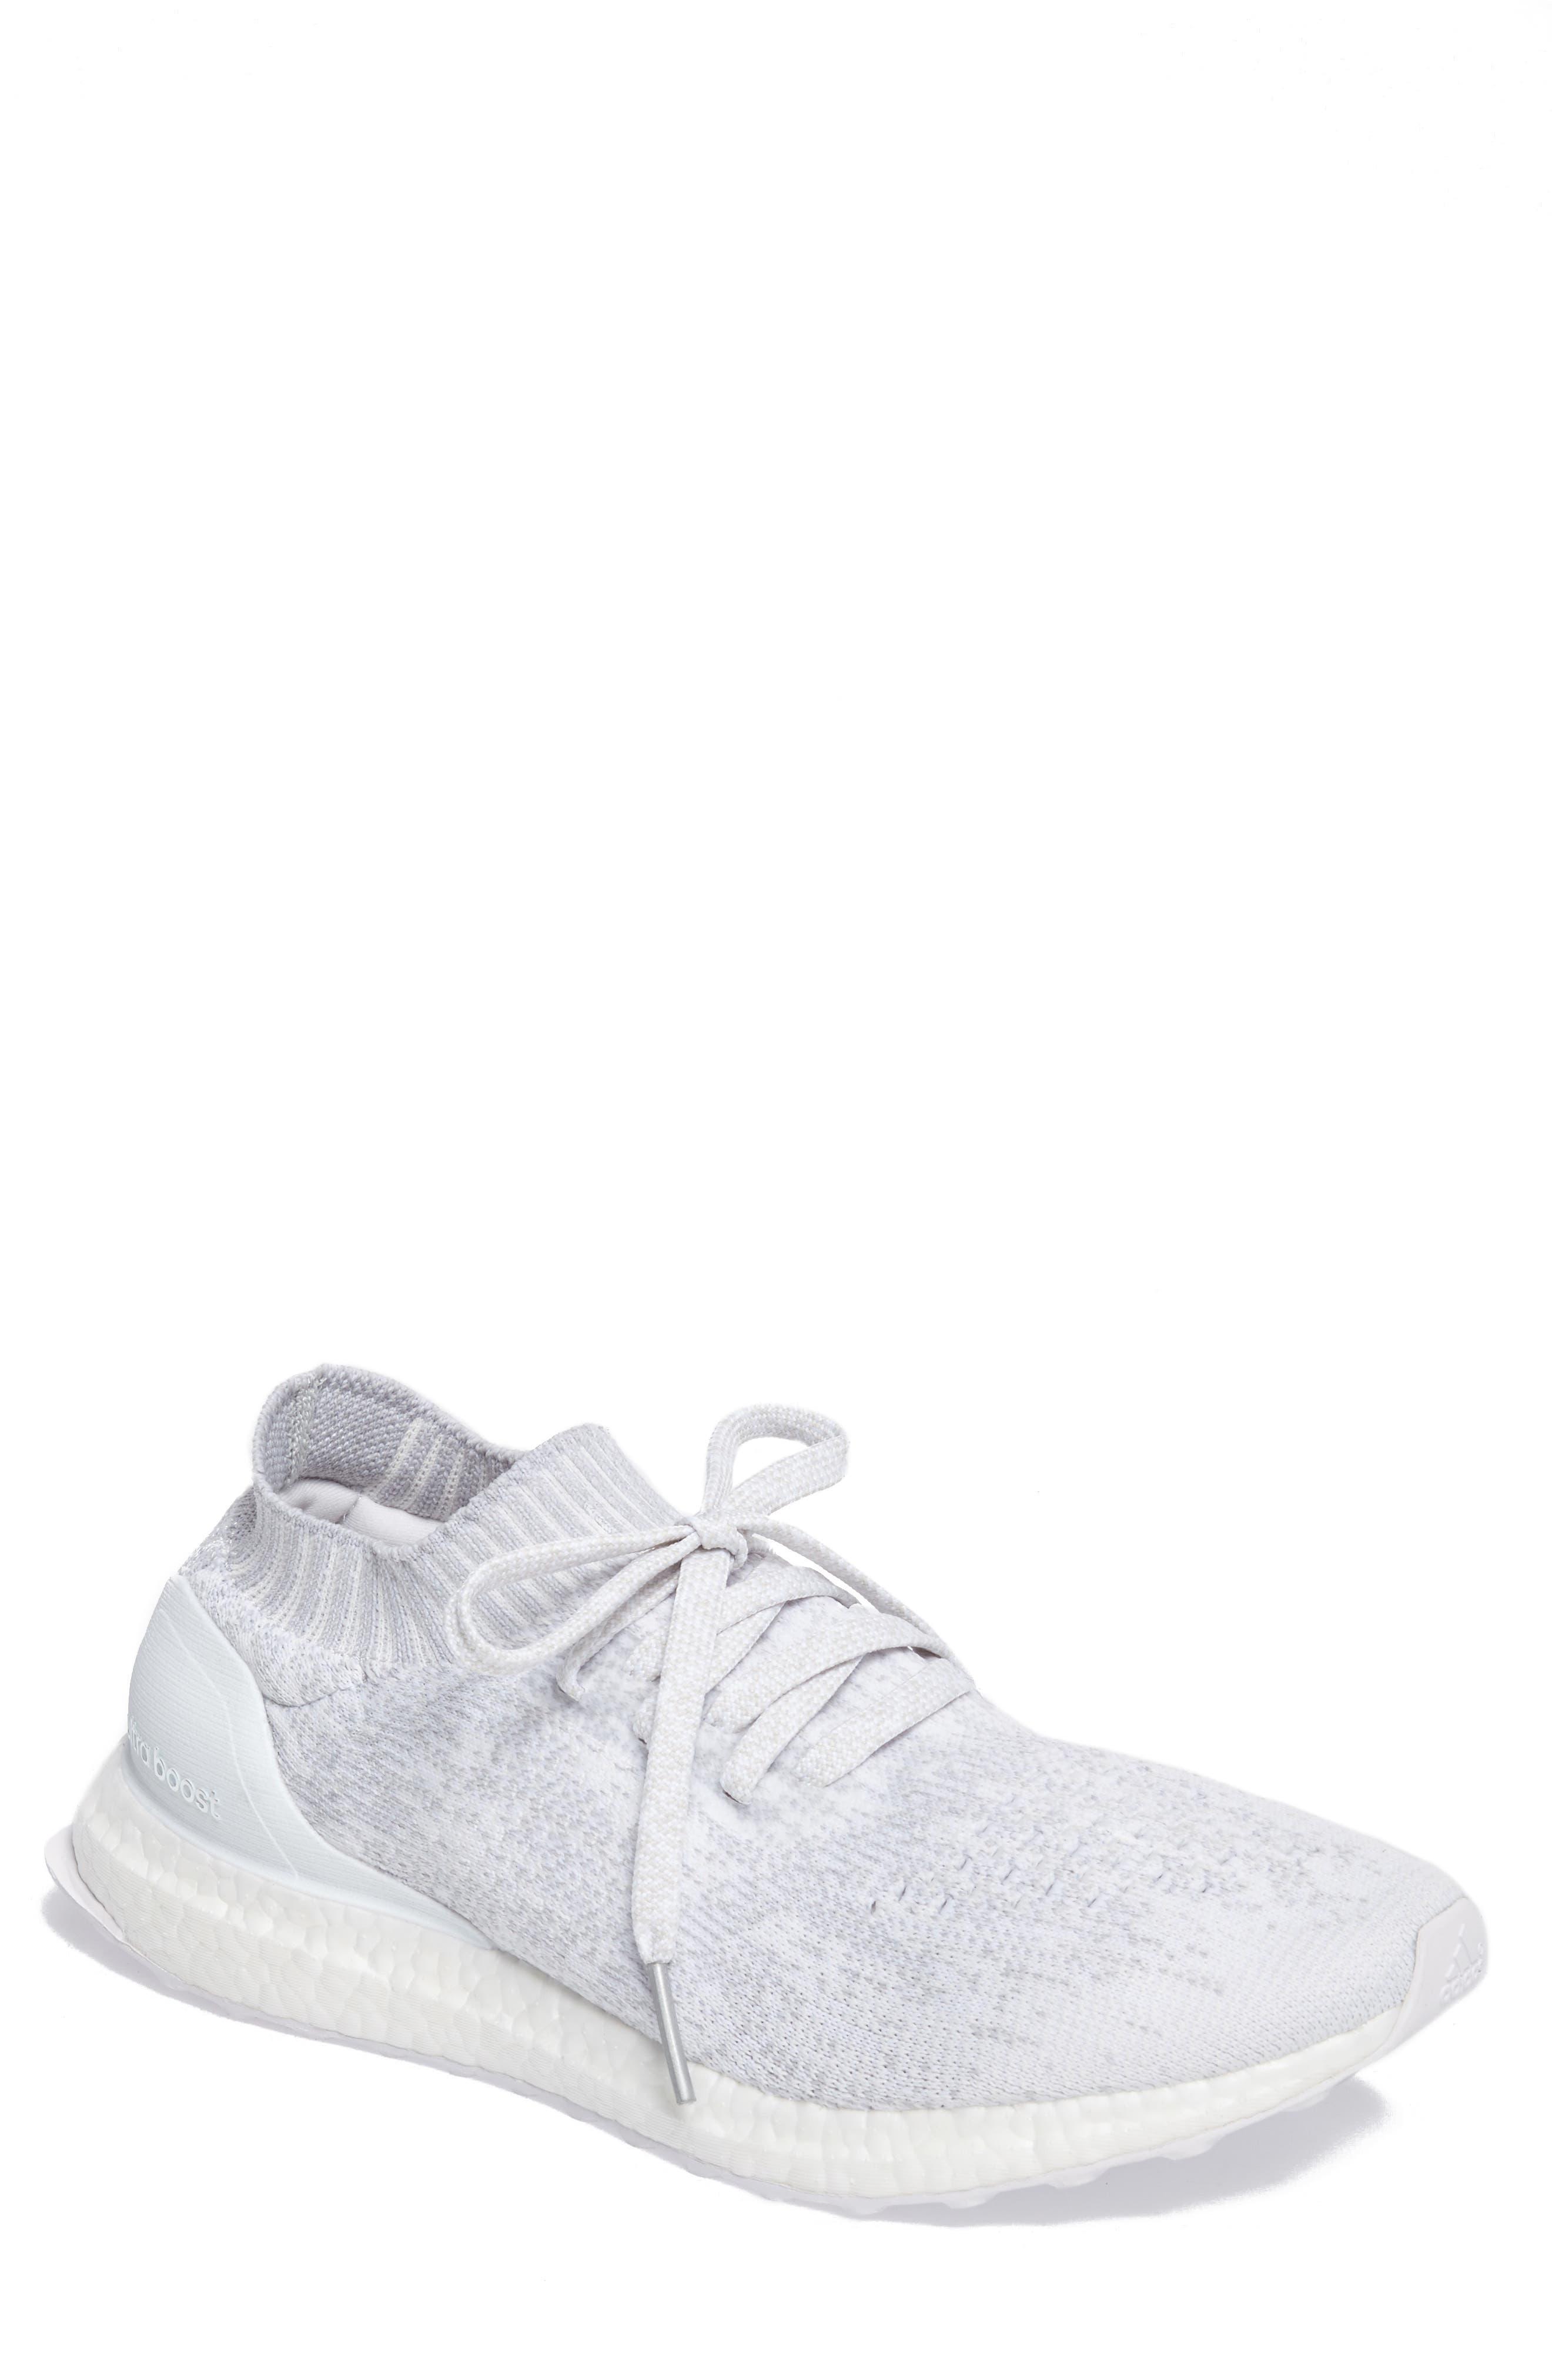 Main Image - adidas 'UltraBOOST Uncaged' Running Shoe (Men)